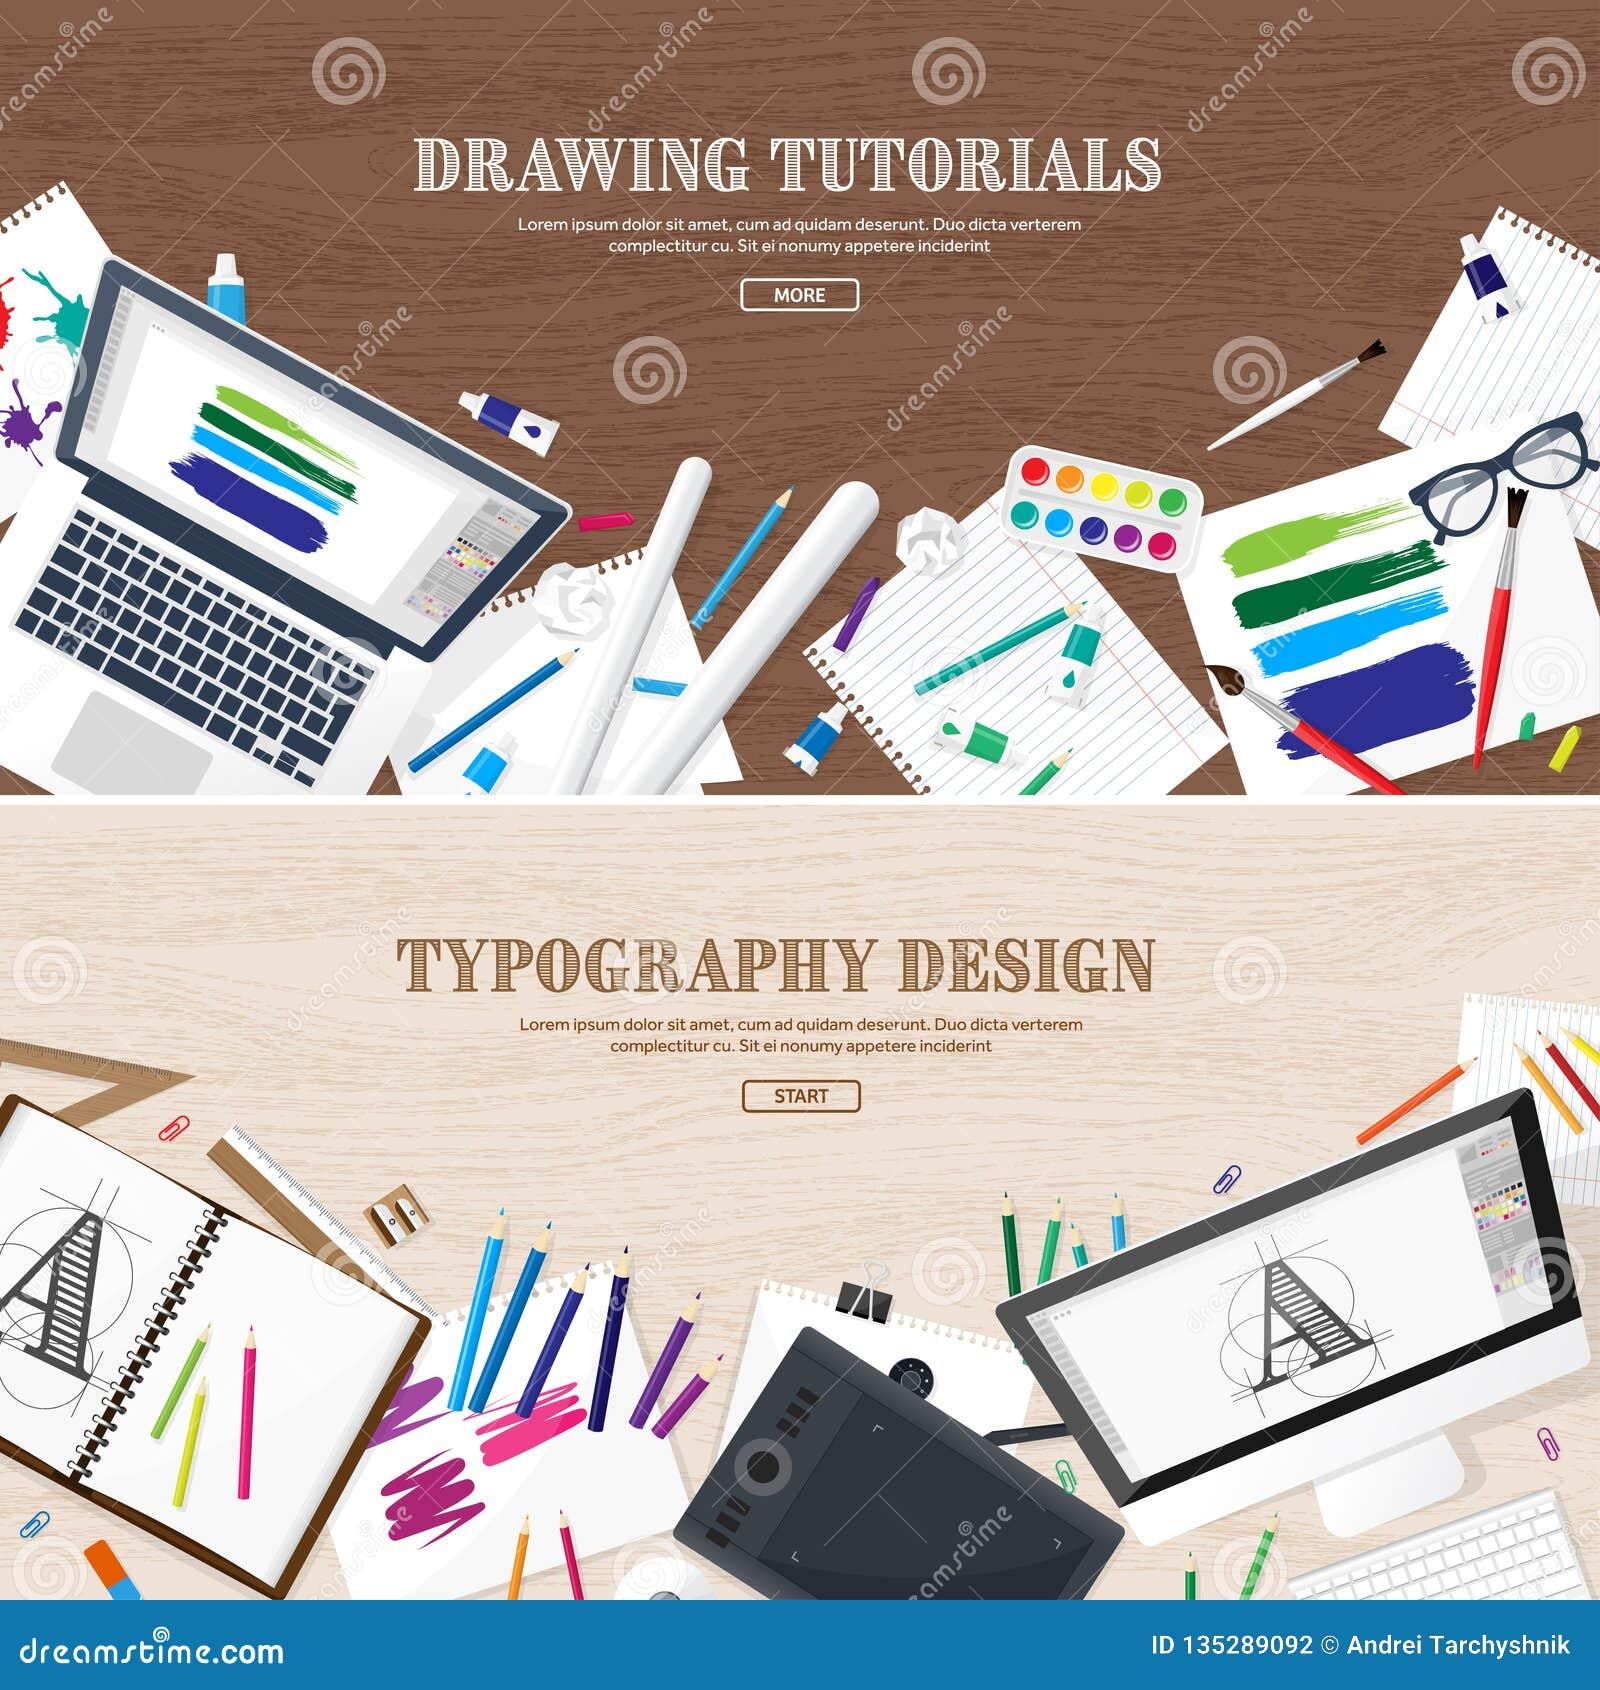 Digital Drawing Graphic Design Workplace Equipment For Designer Ui Back To School Study Pen Stock Vector Illustration Of Freelance Internet 135289092